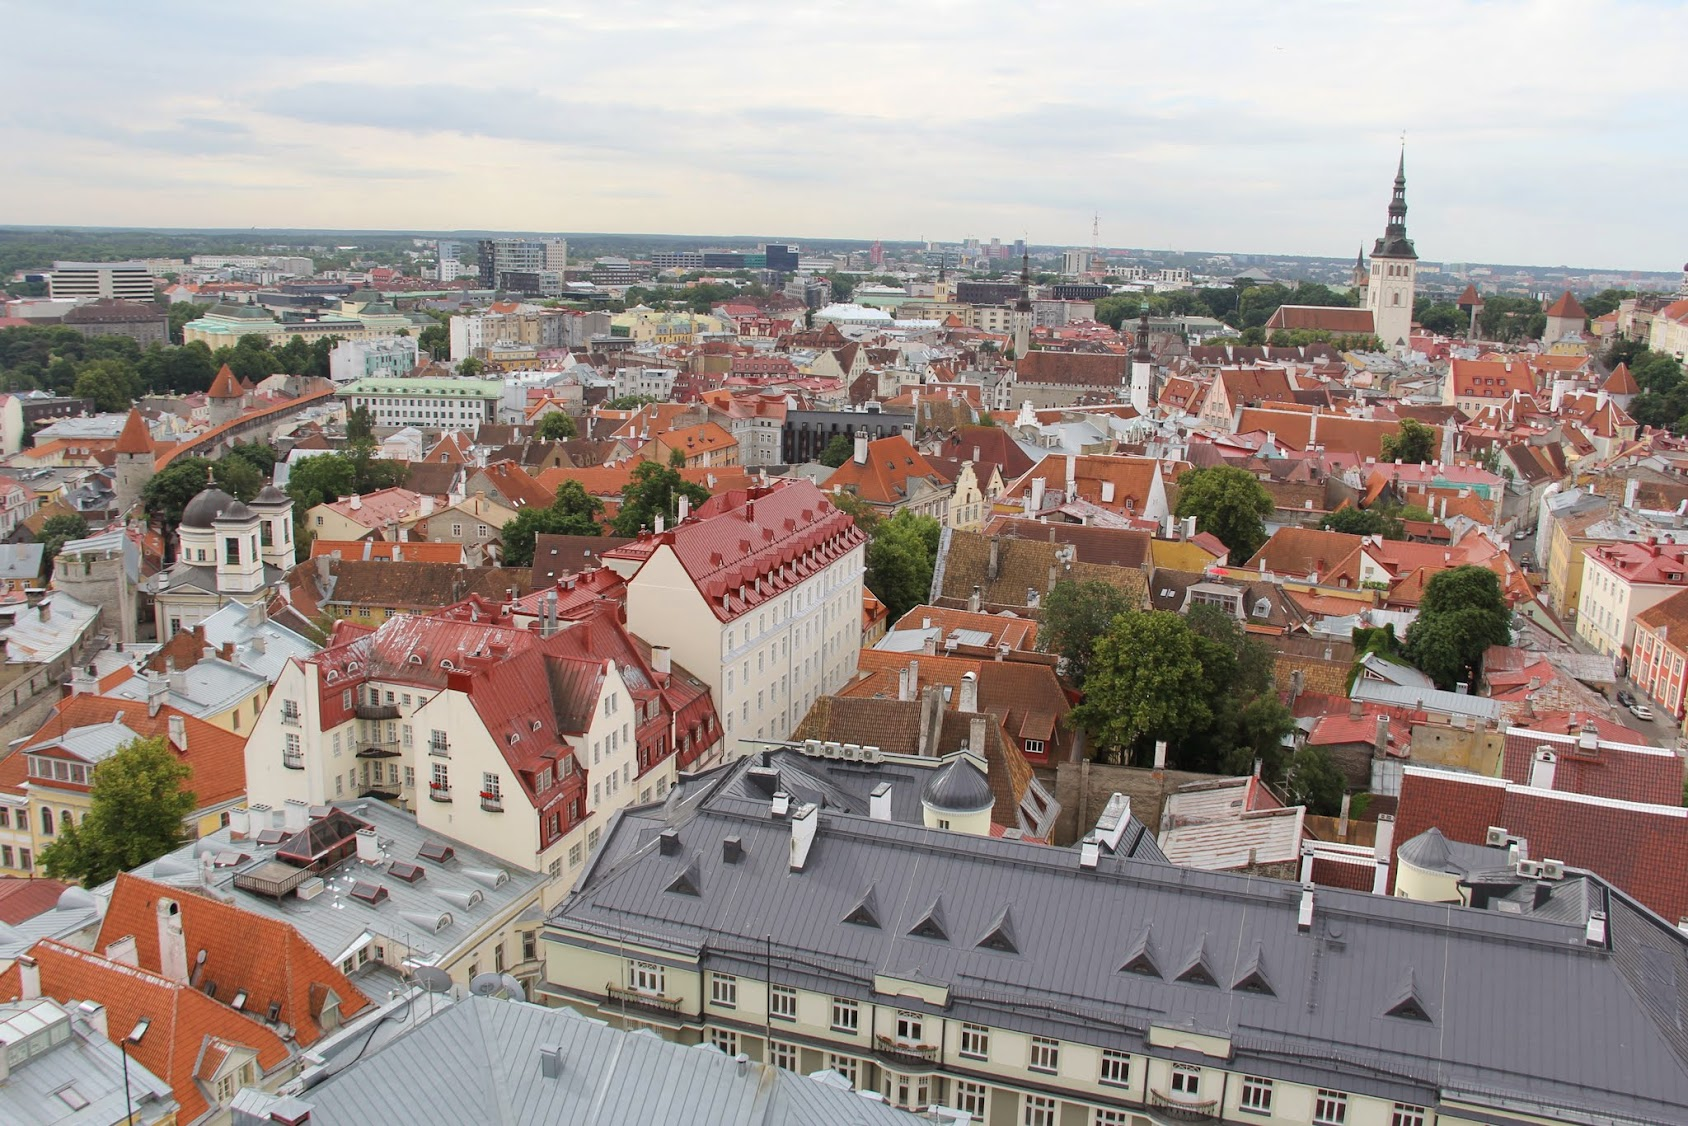 The Most Popular Tour in Tallinn